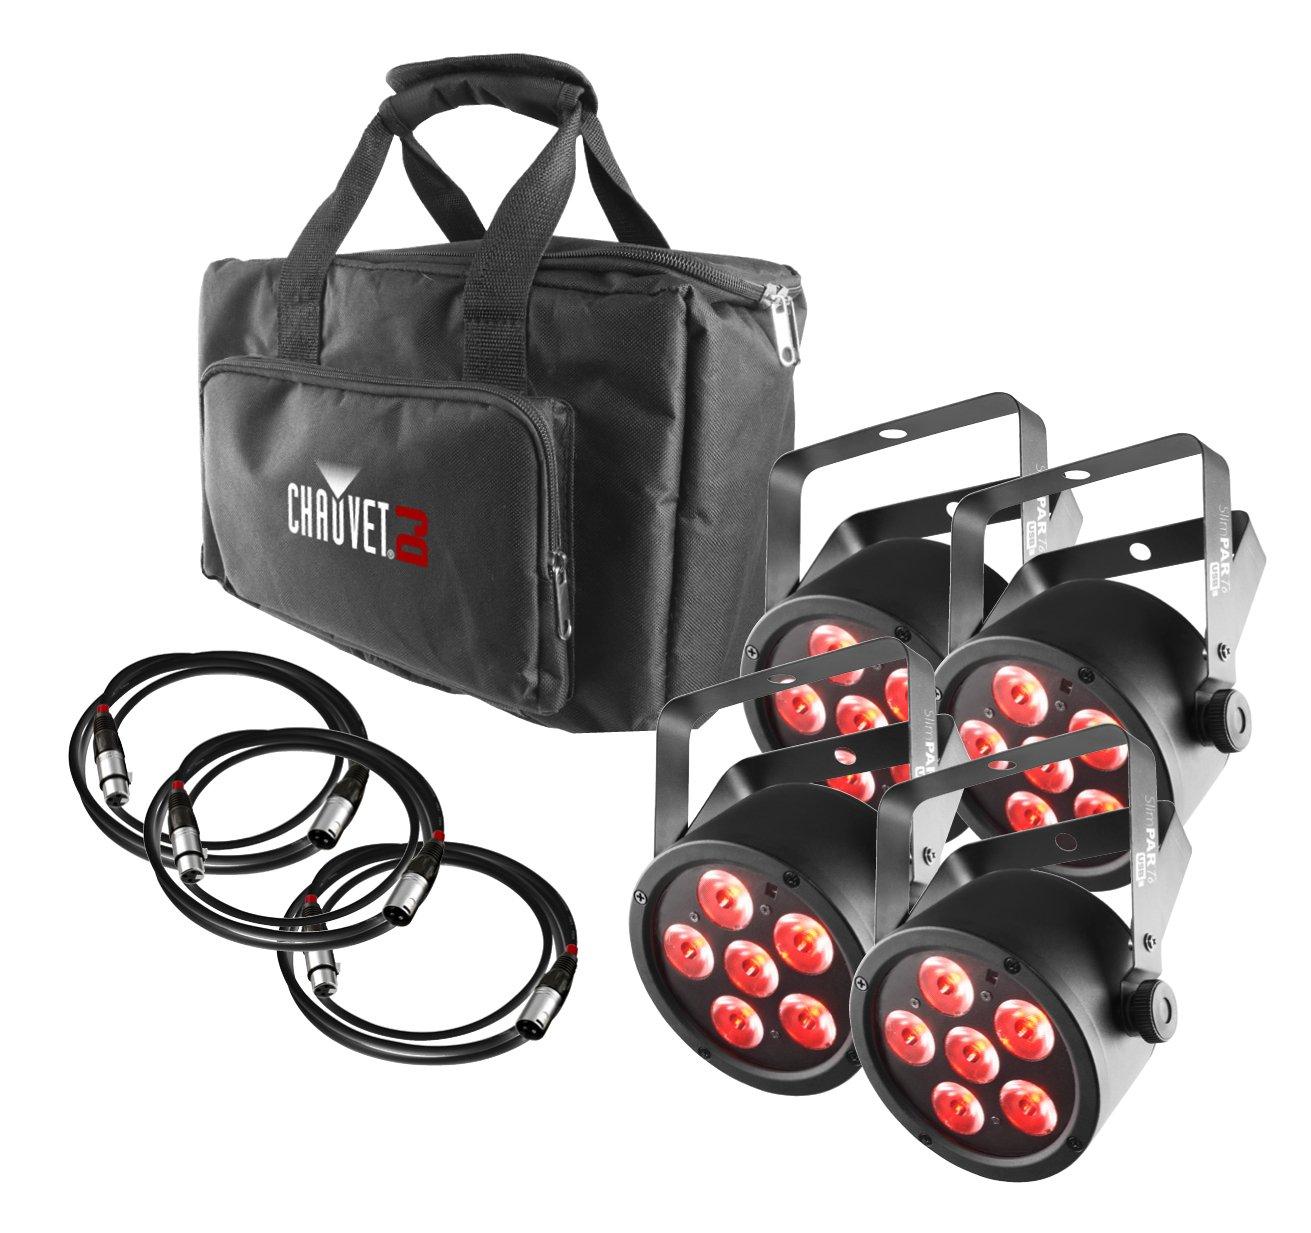 CHAUVET DJ SlimPACK T6 USB - 4 SlimPAR T6 USB Lights & 3 DMX Cables w/Gear Bag | LED Lighting by CHAUVET DJ